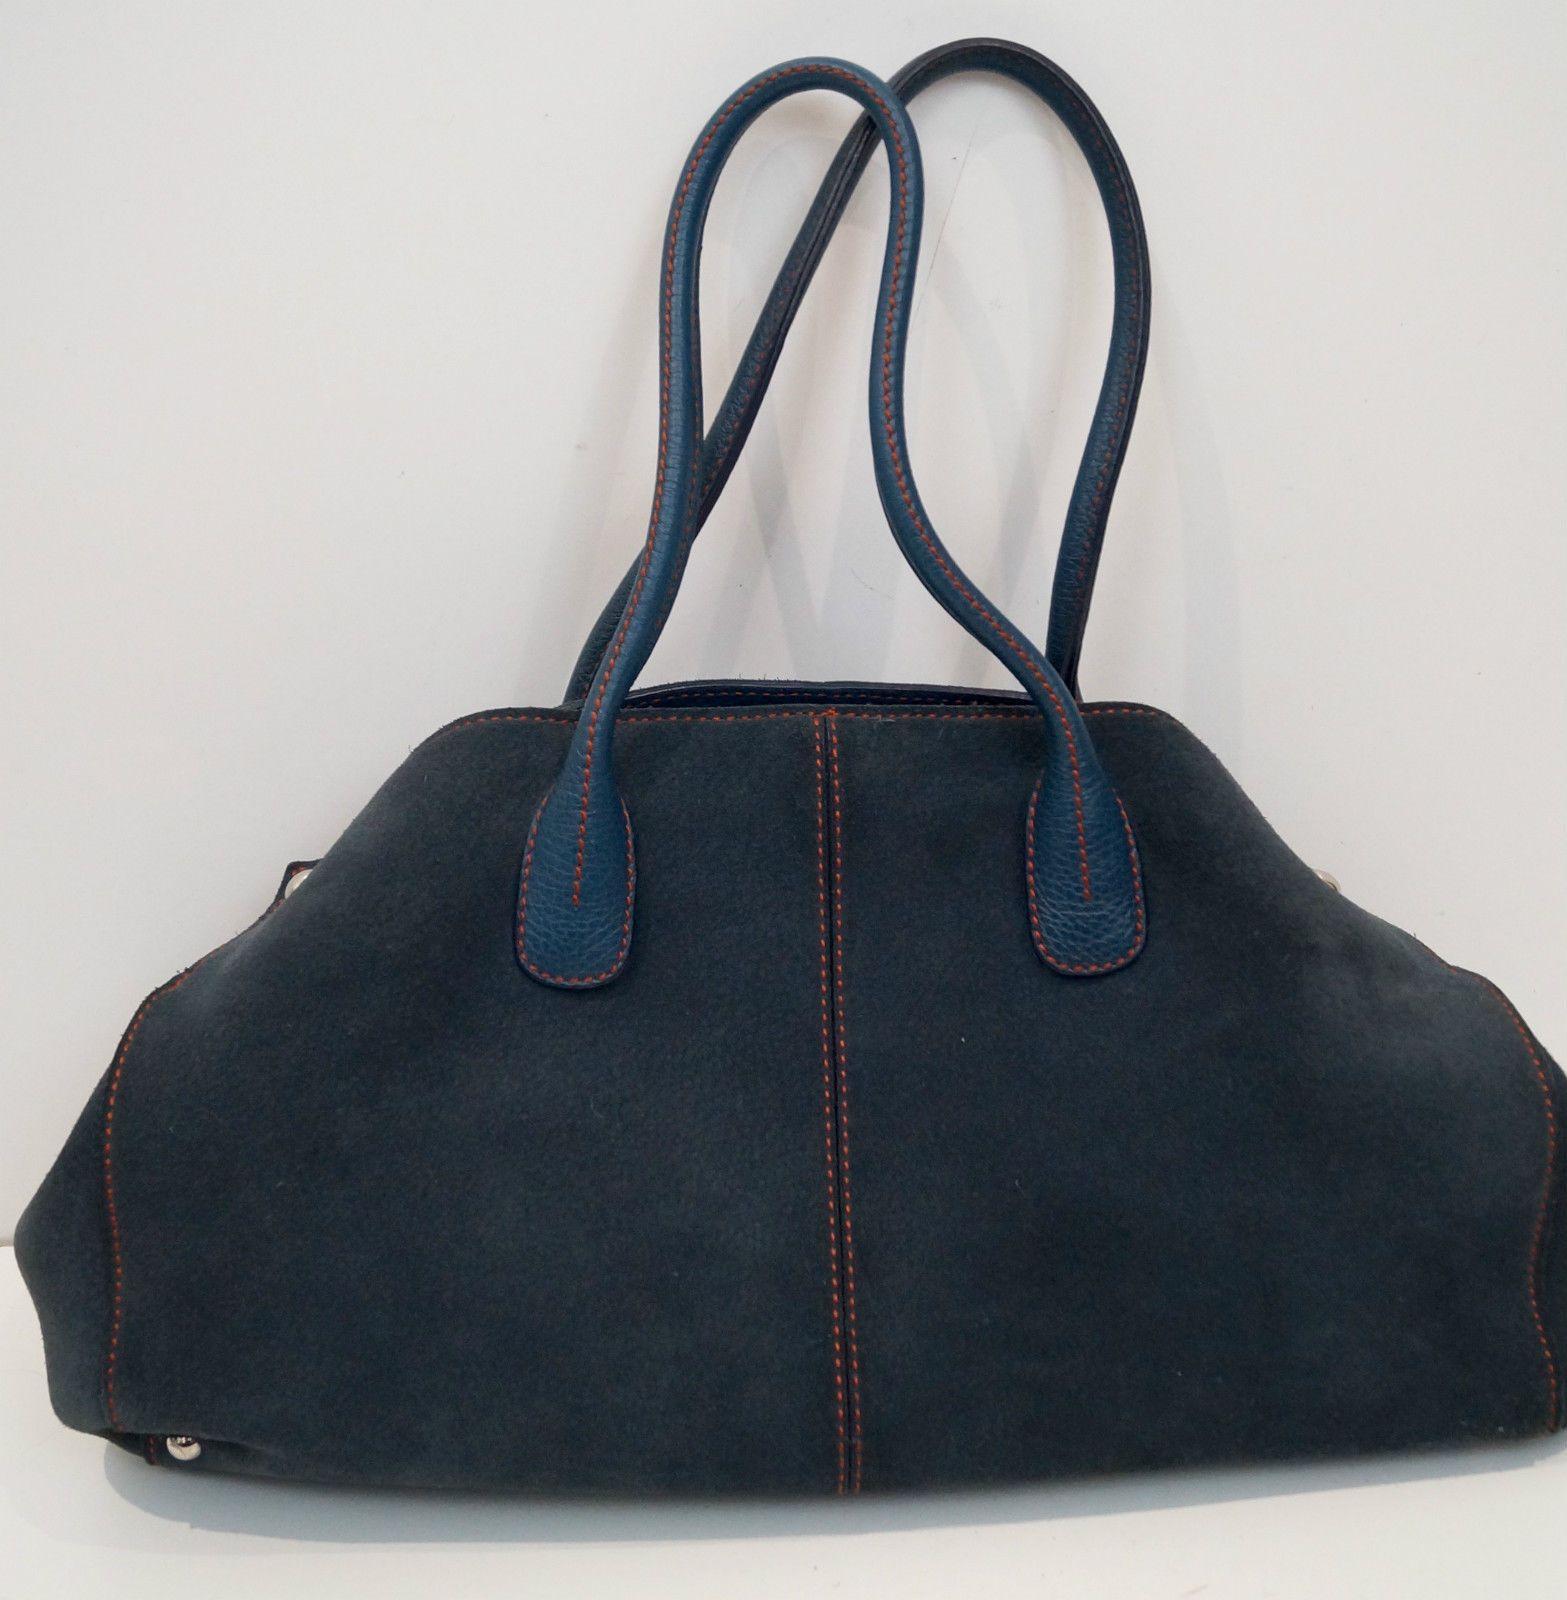 TODS Women's Midnight Navy Blue Suede Branded Medium Tote Bowling Shoulder  Bag | eBay